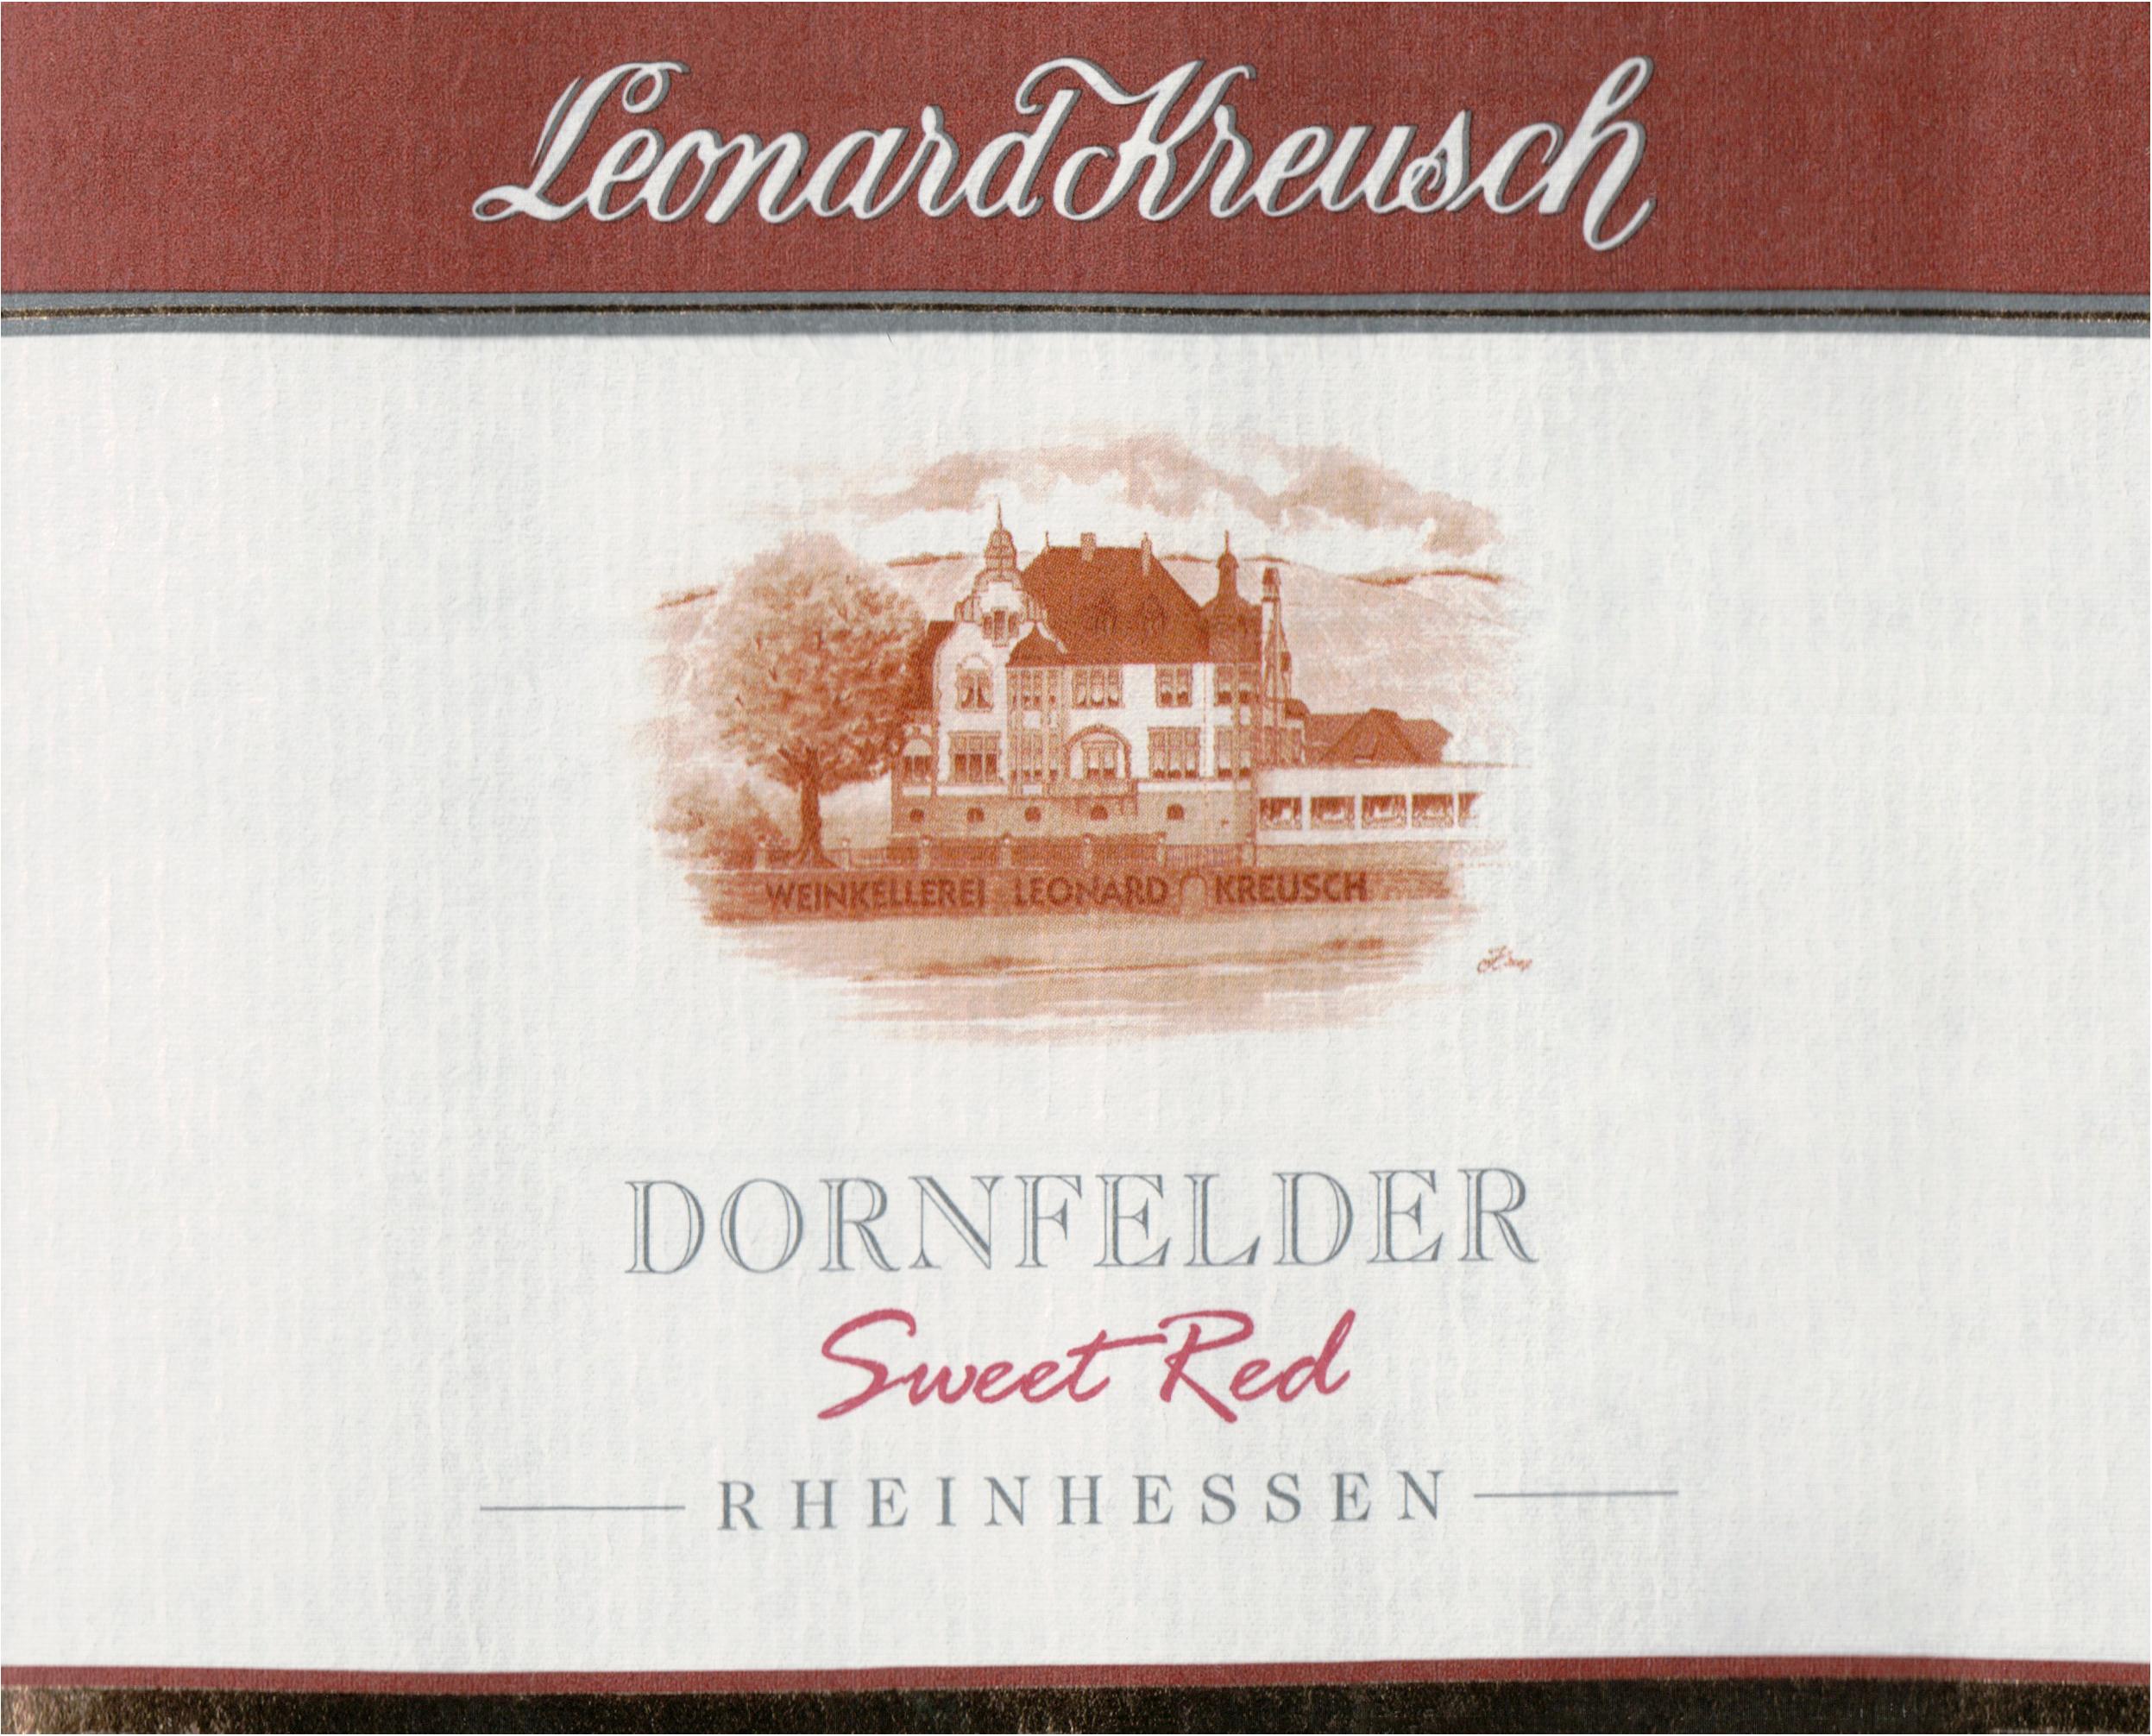 Leonard Kreusch Dornfelder